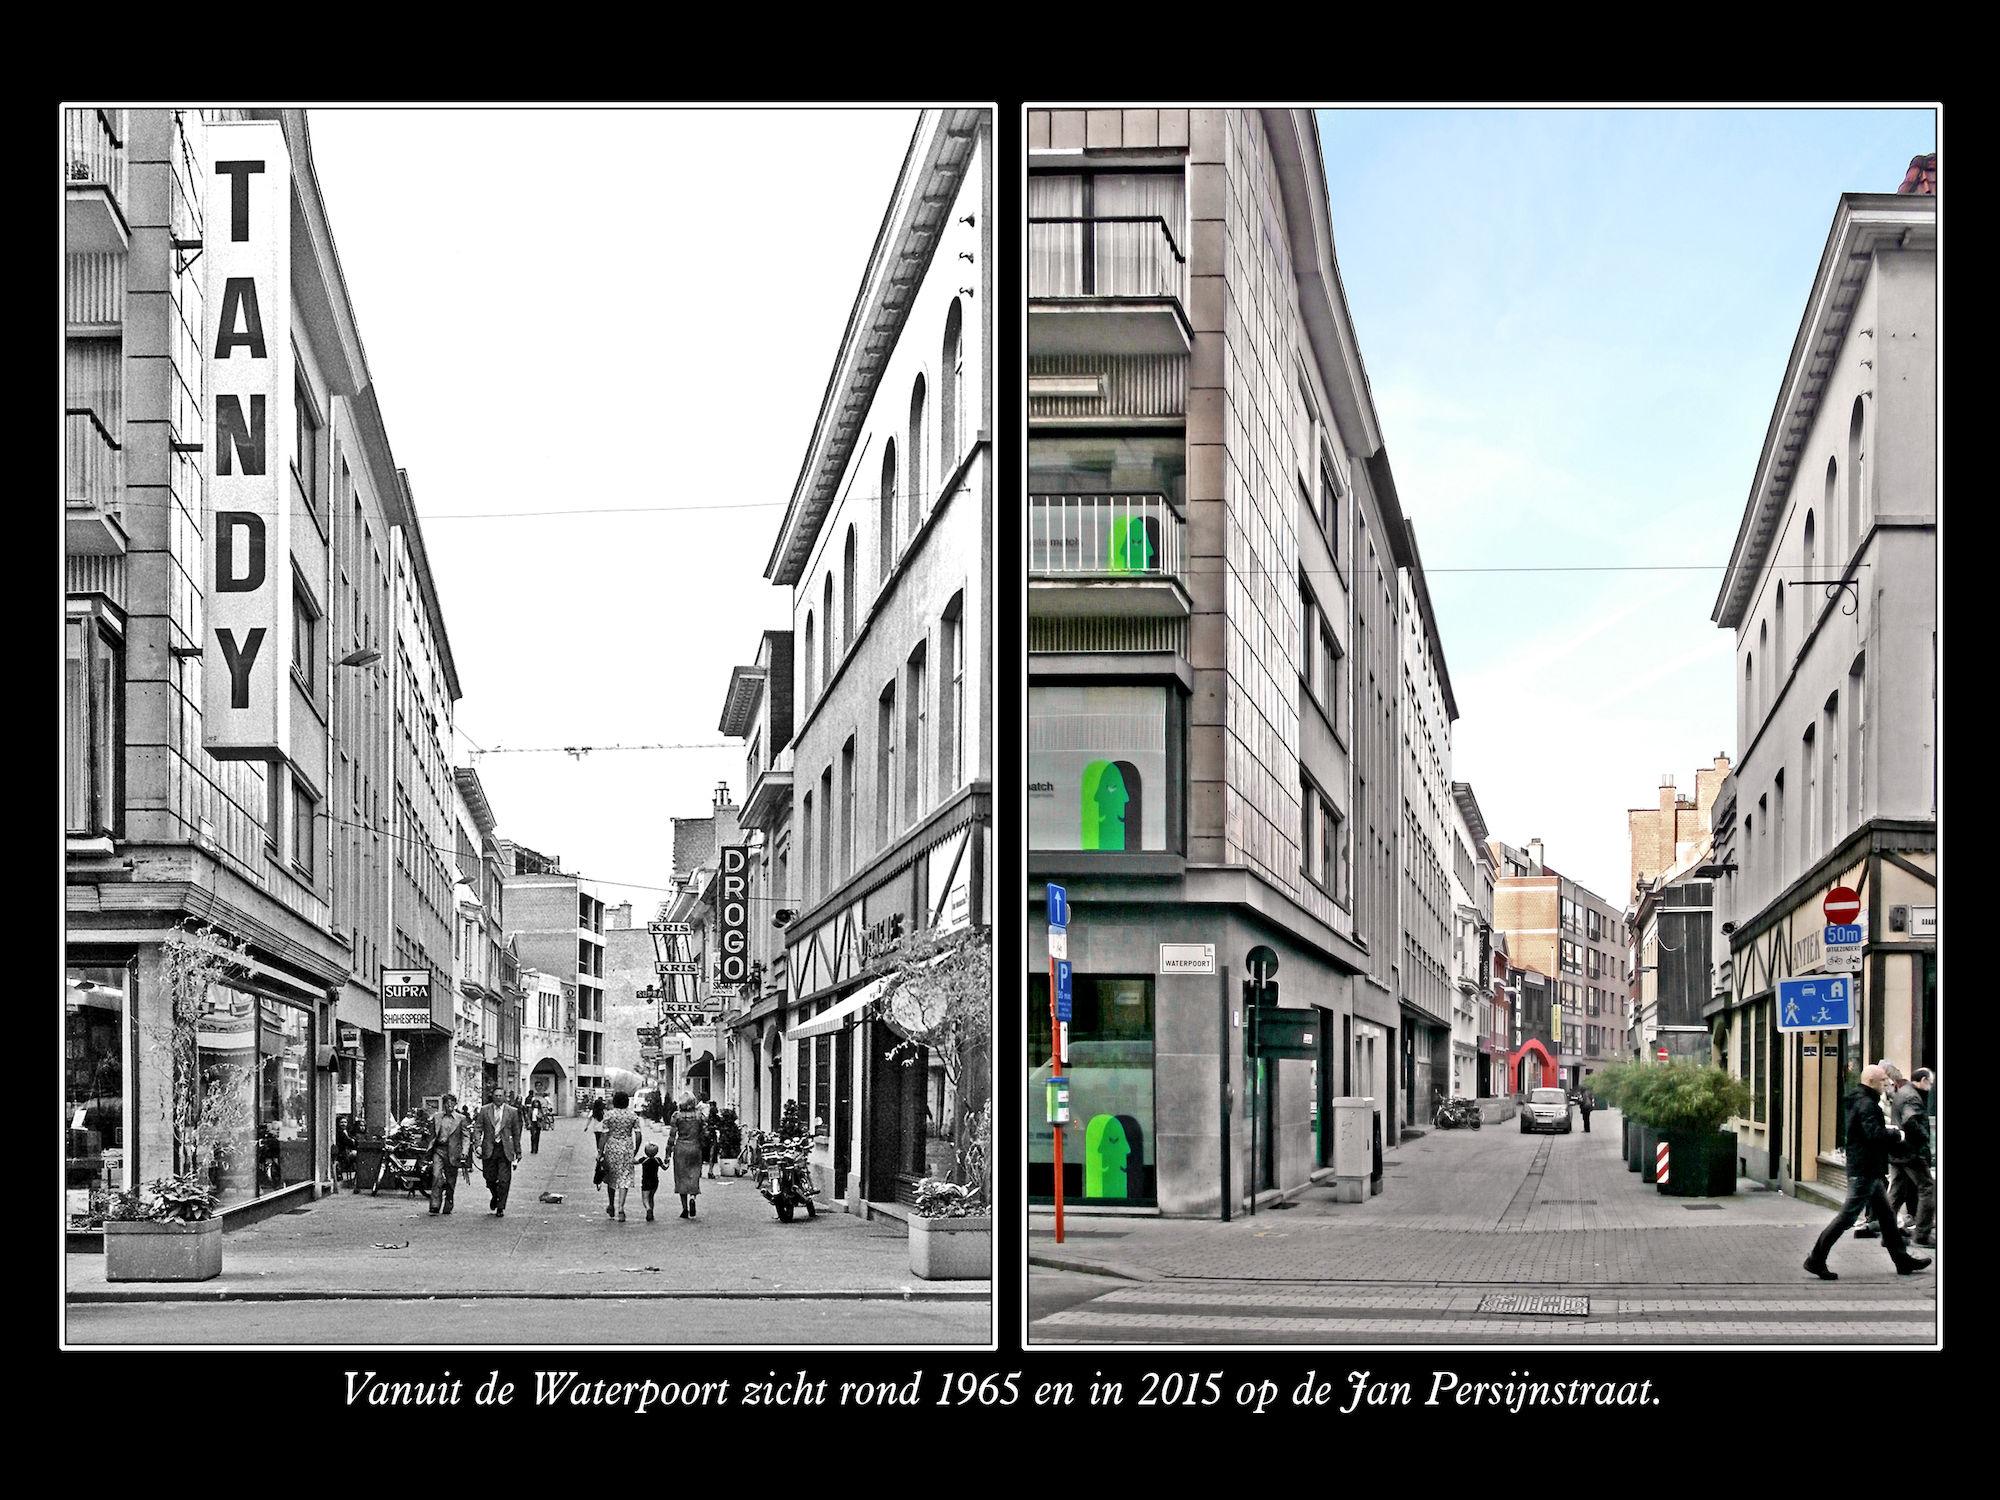 Jan Persijnstraat ca 1965 en 2015